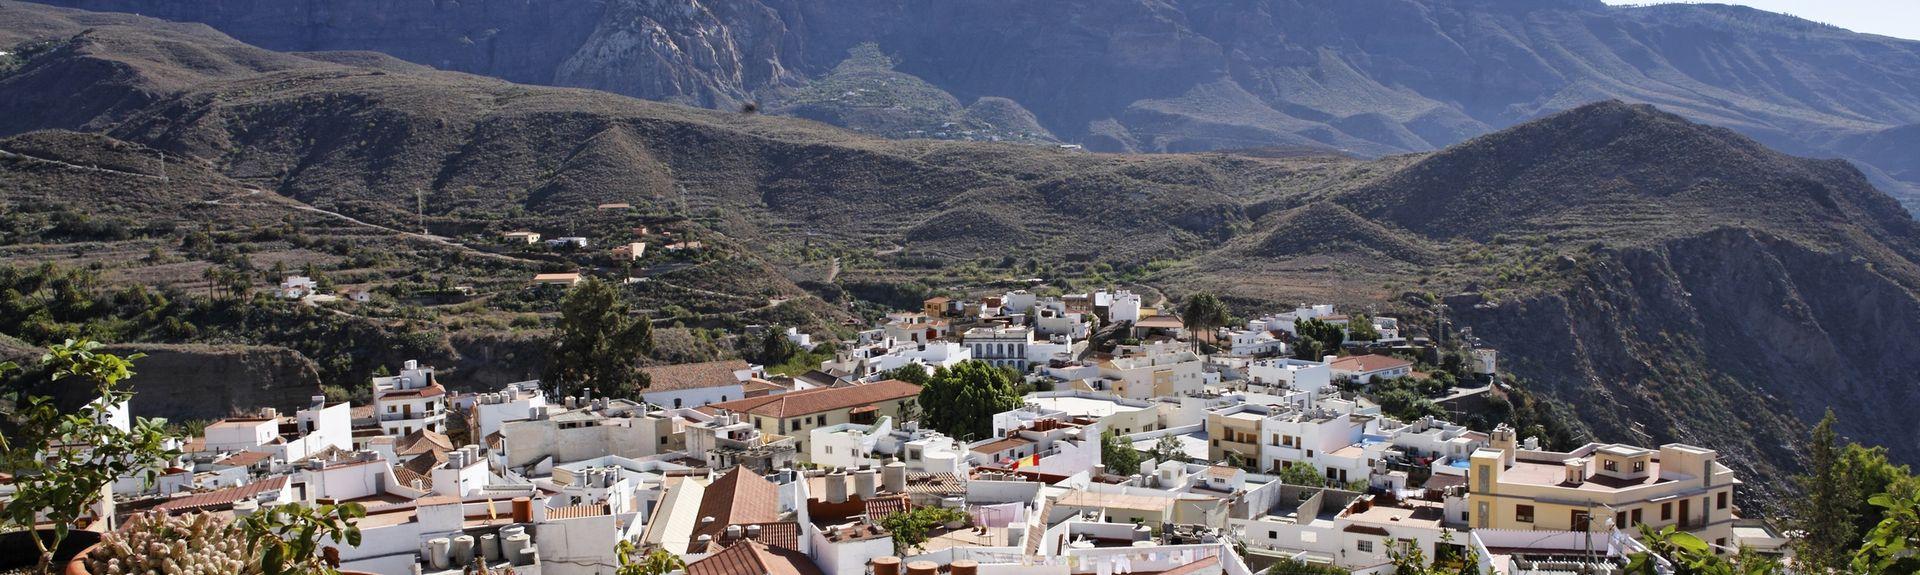 San Bartolome de Tirajana, Kanarieöarna, Spanien